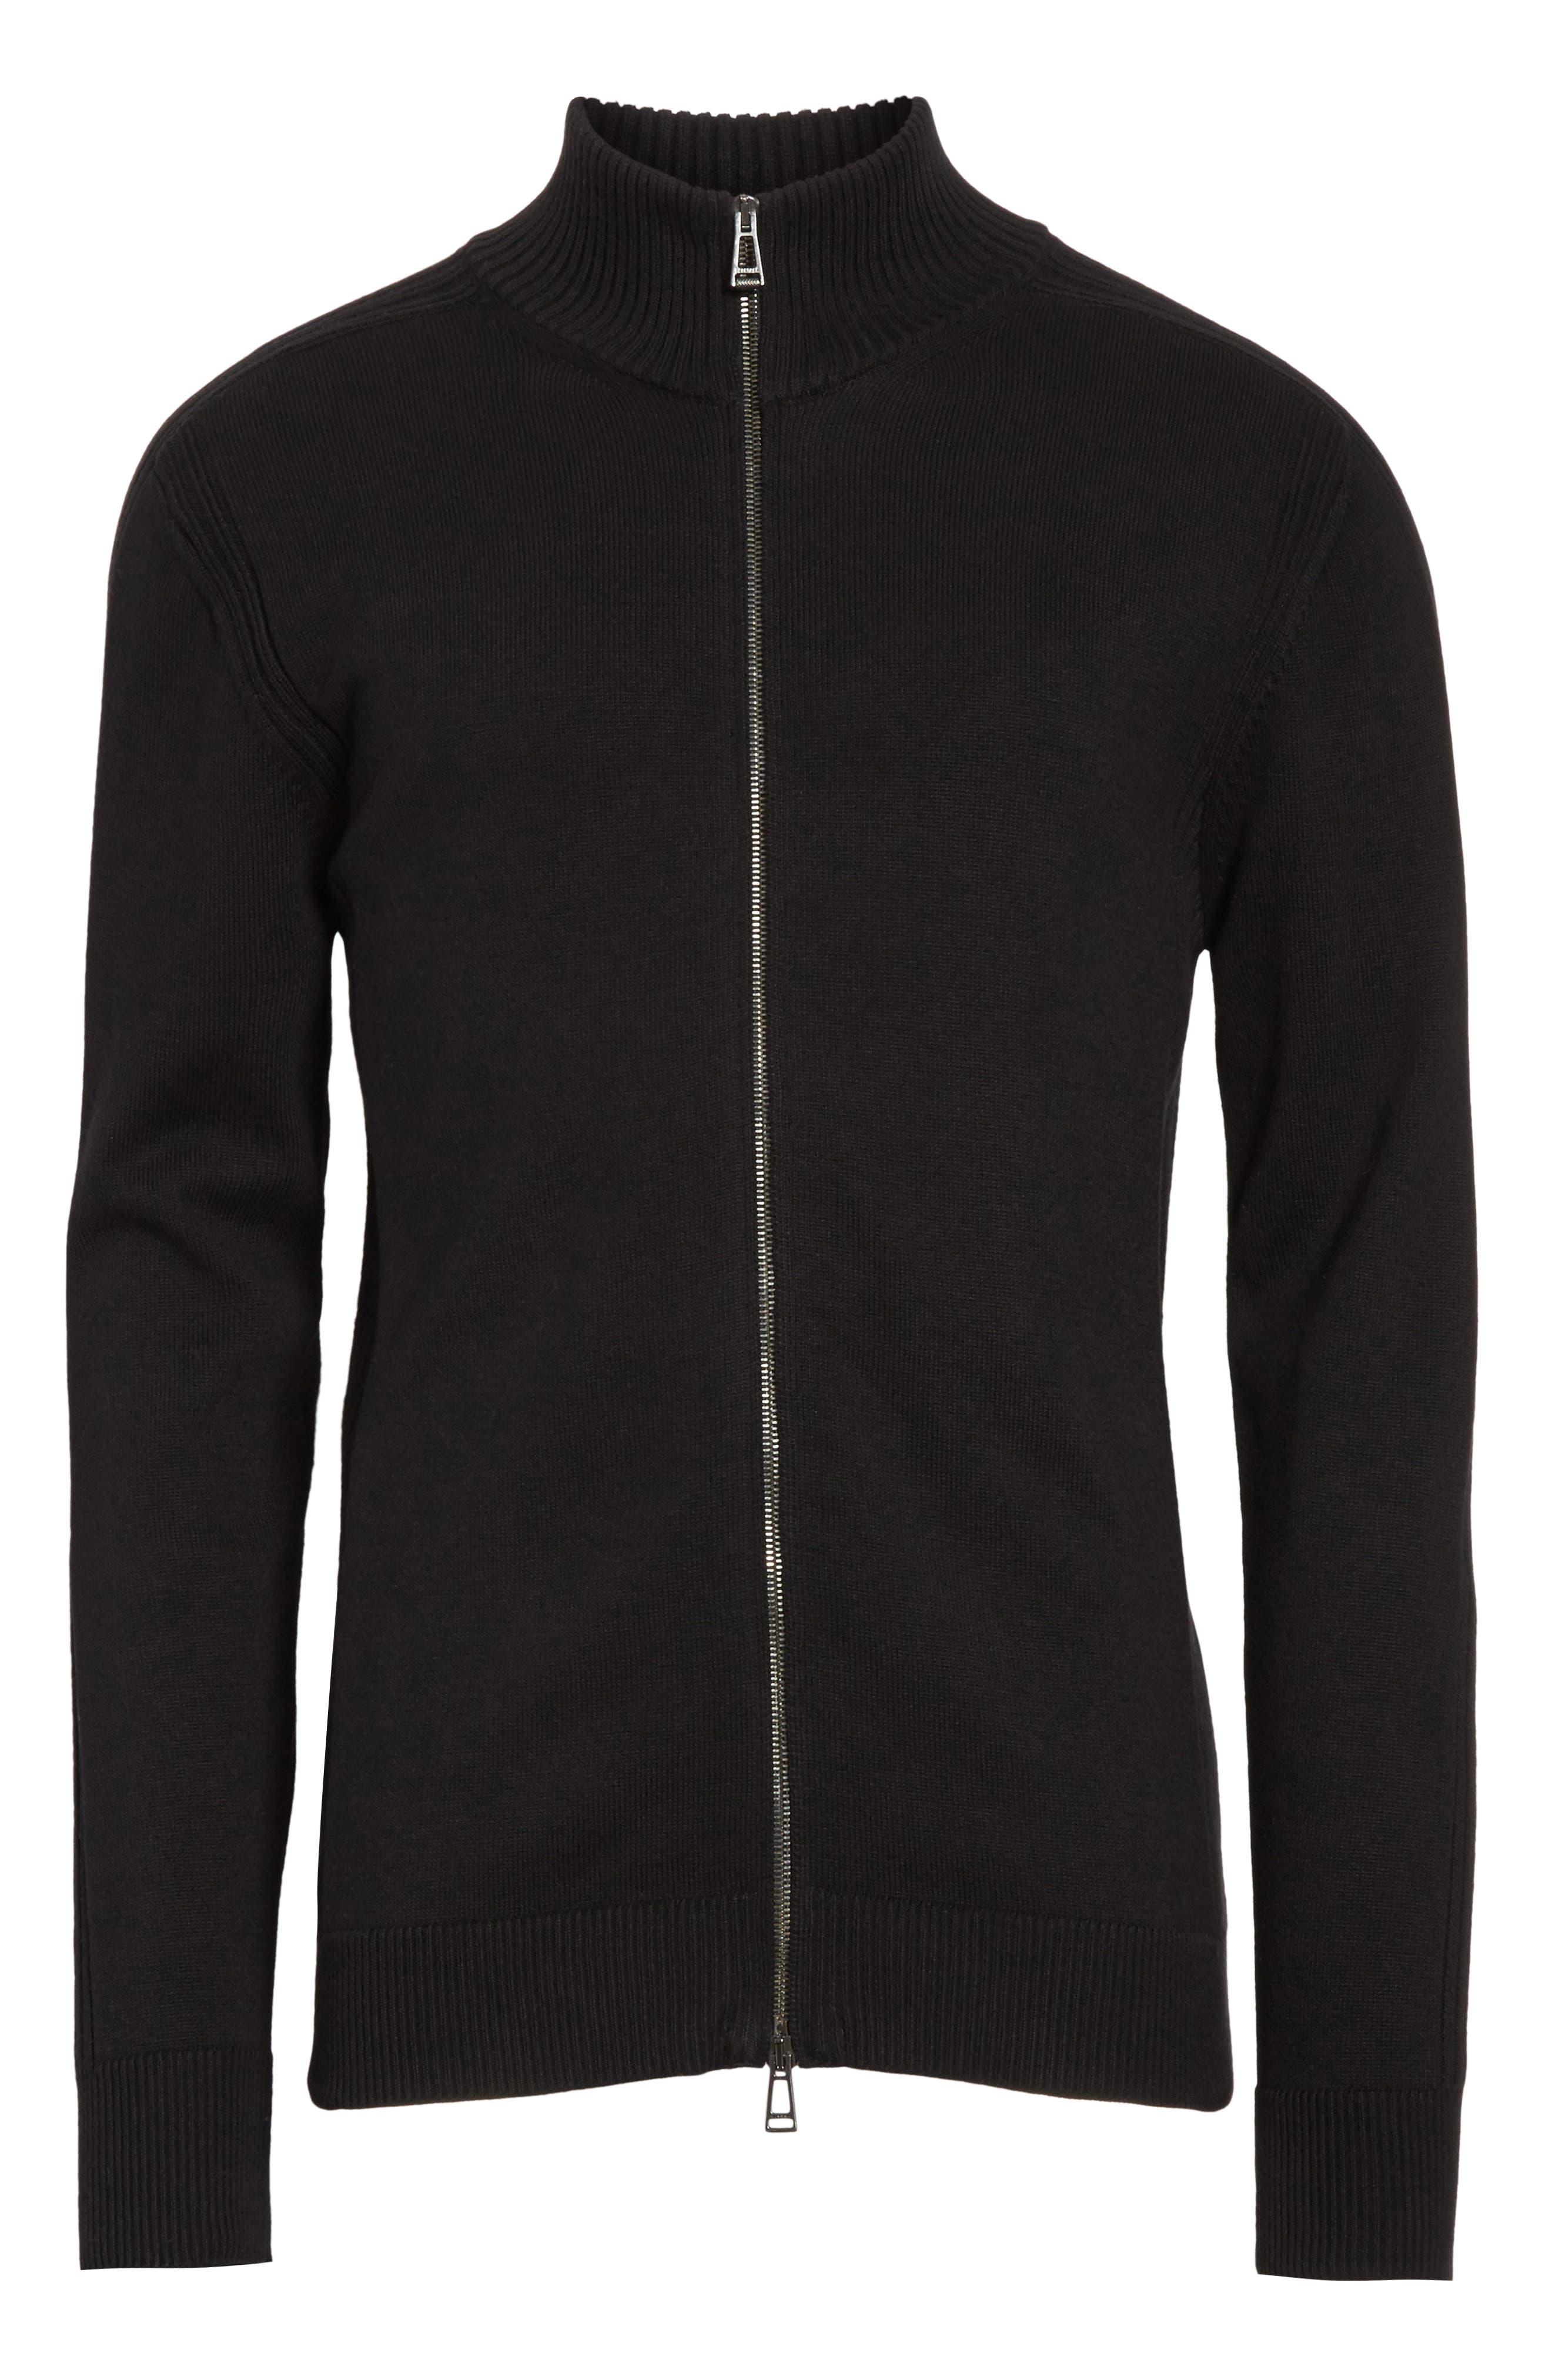 Allerford Knit Cotton Jacket,                             Alternate thumbnail 5, color,                             001